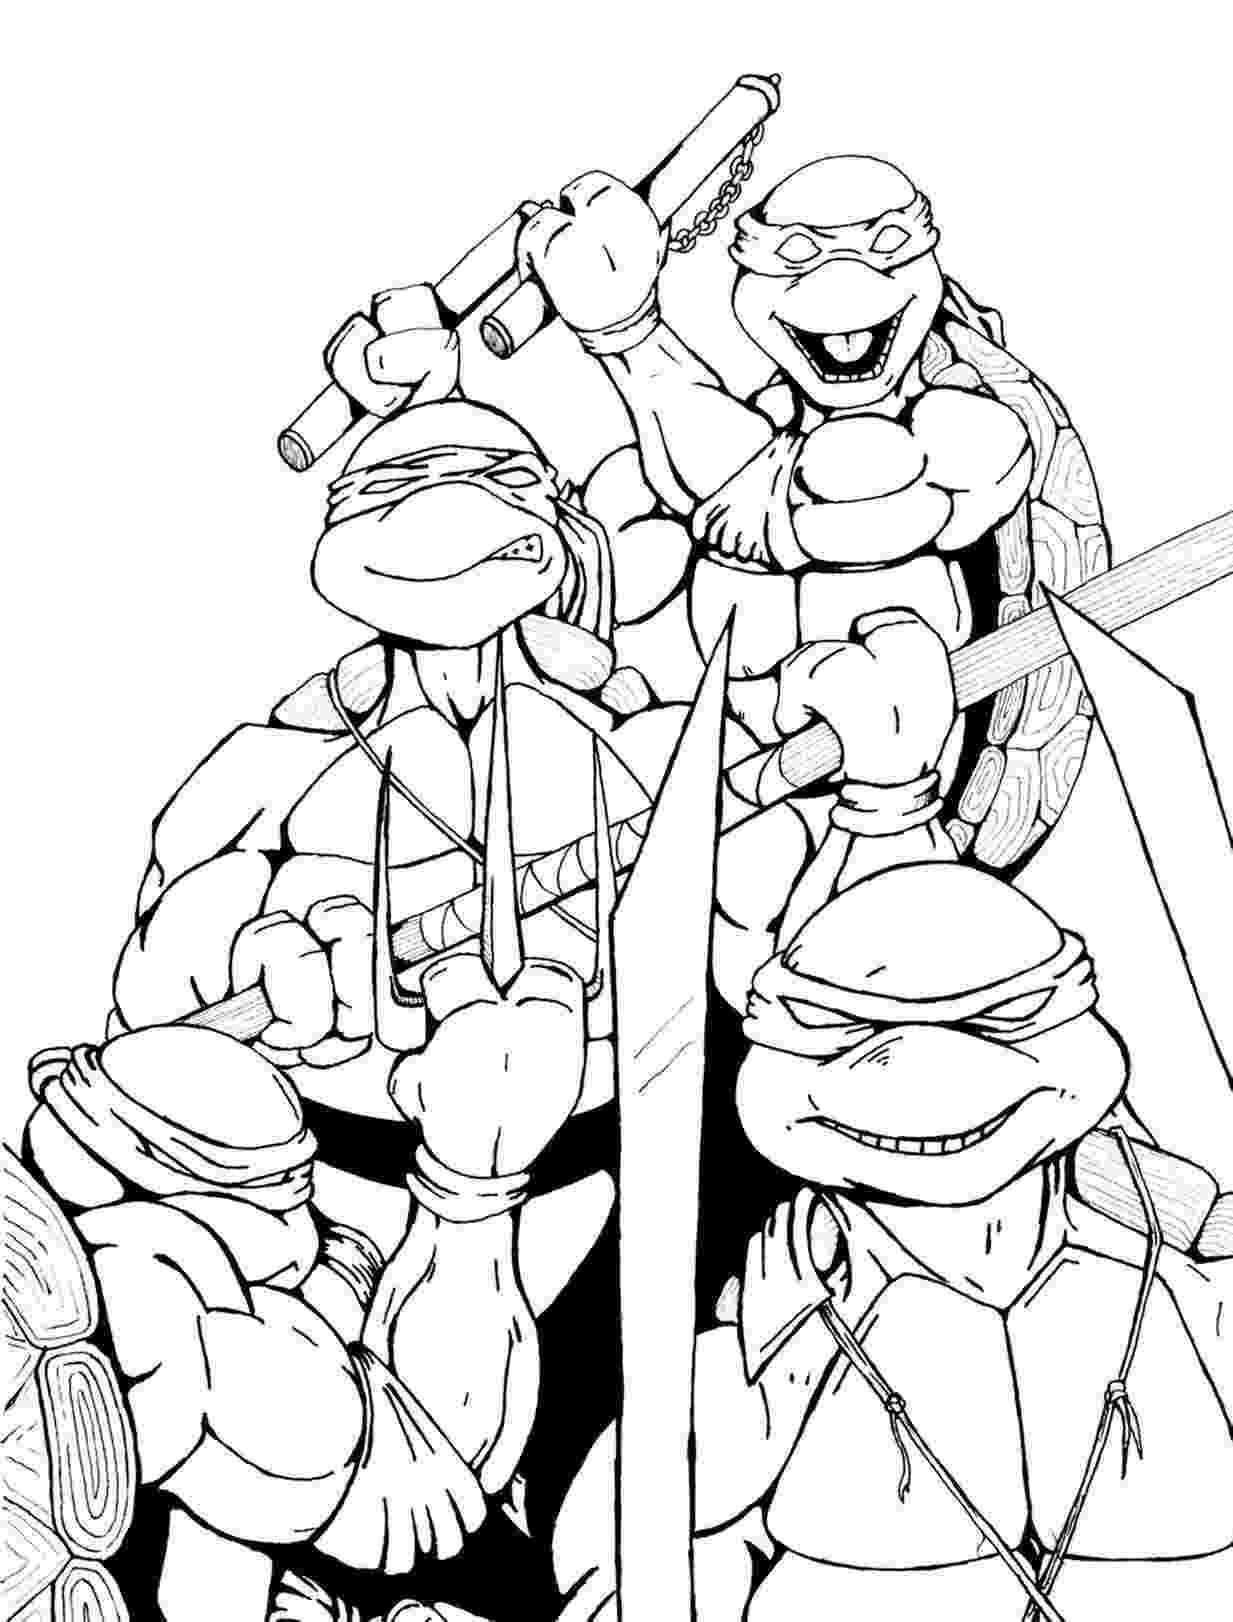 pictures of the ninja turtles ninja turtles by petex on deviantart the turtles pictures of ninja